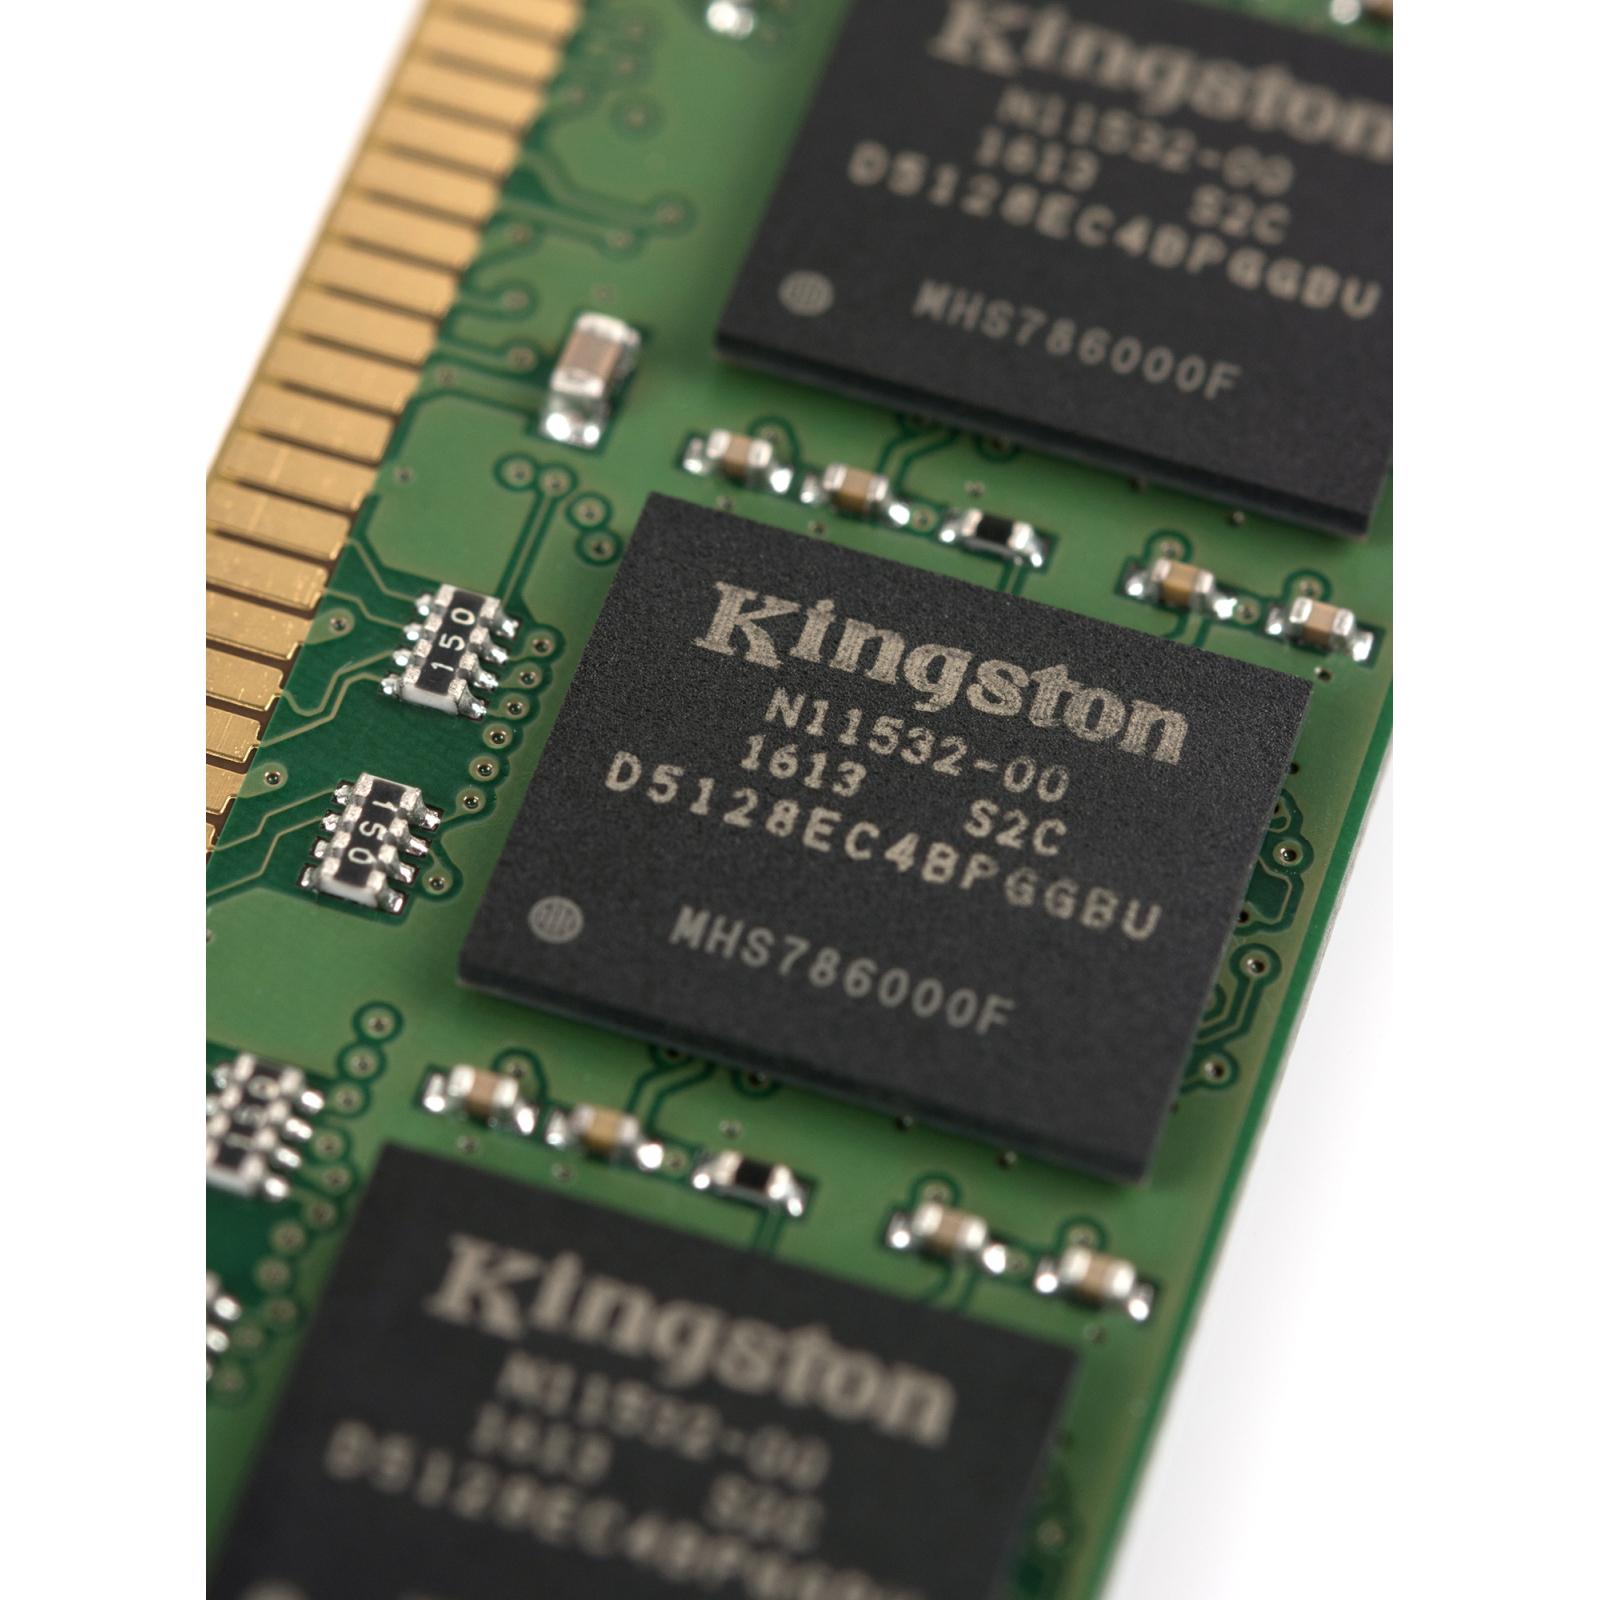 Модуль памяти для компьютера DDR3 8GB 1333 MHz Kingston (KVR1333D3N9/8G) изображение 4